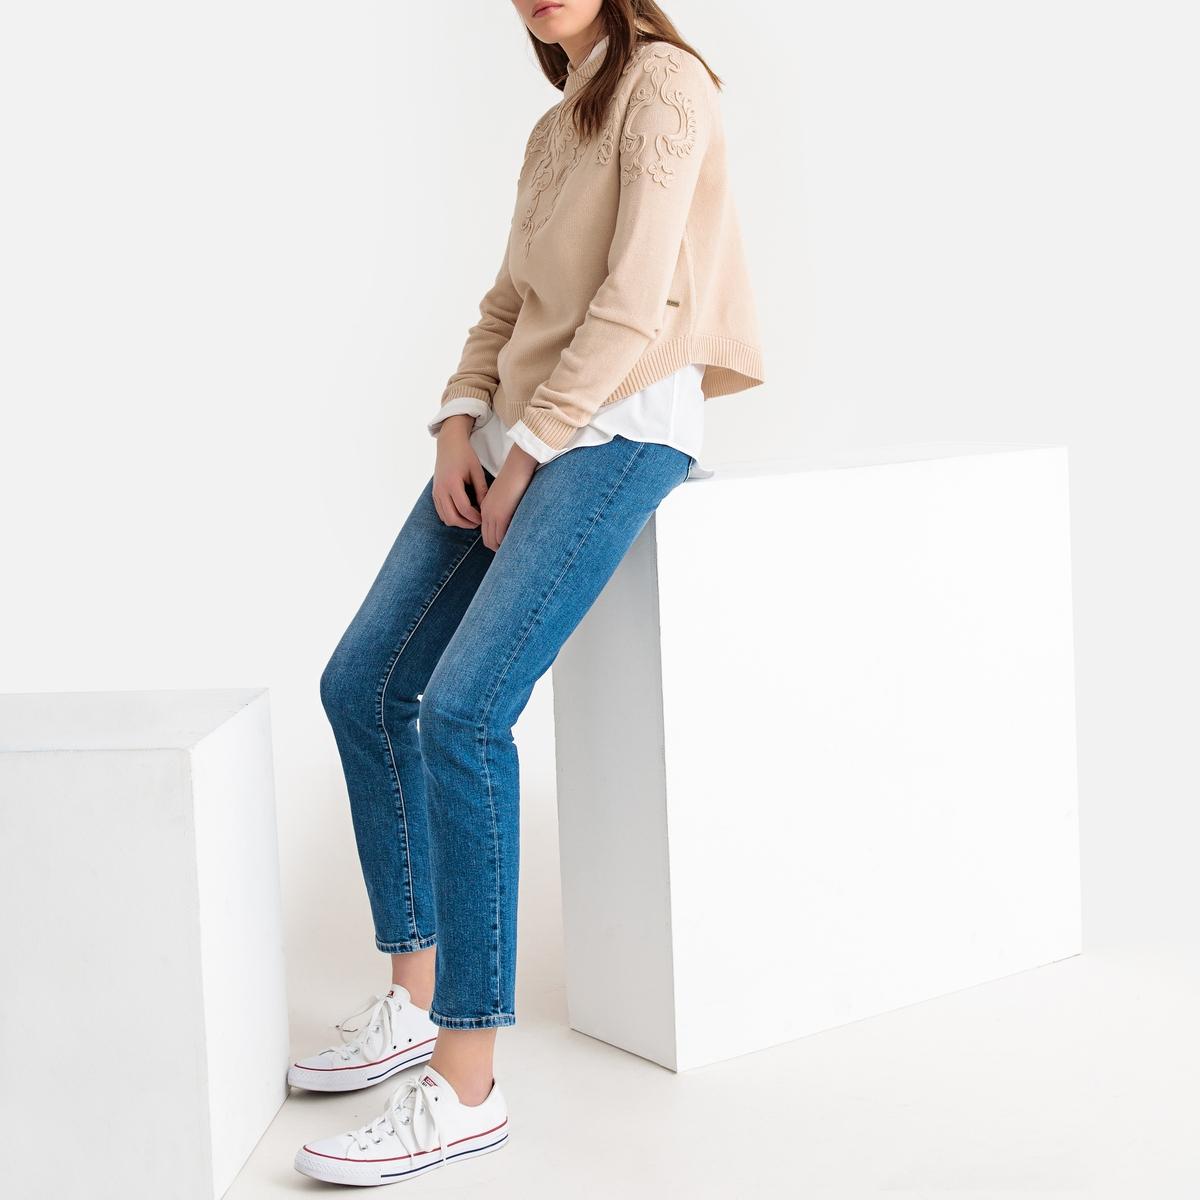 Imagen secundaria de producto de Jersey con cuello redondo de punto fino con bordados - Pepe Jeans